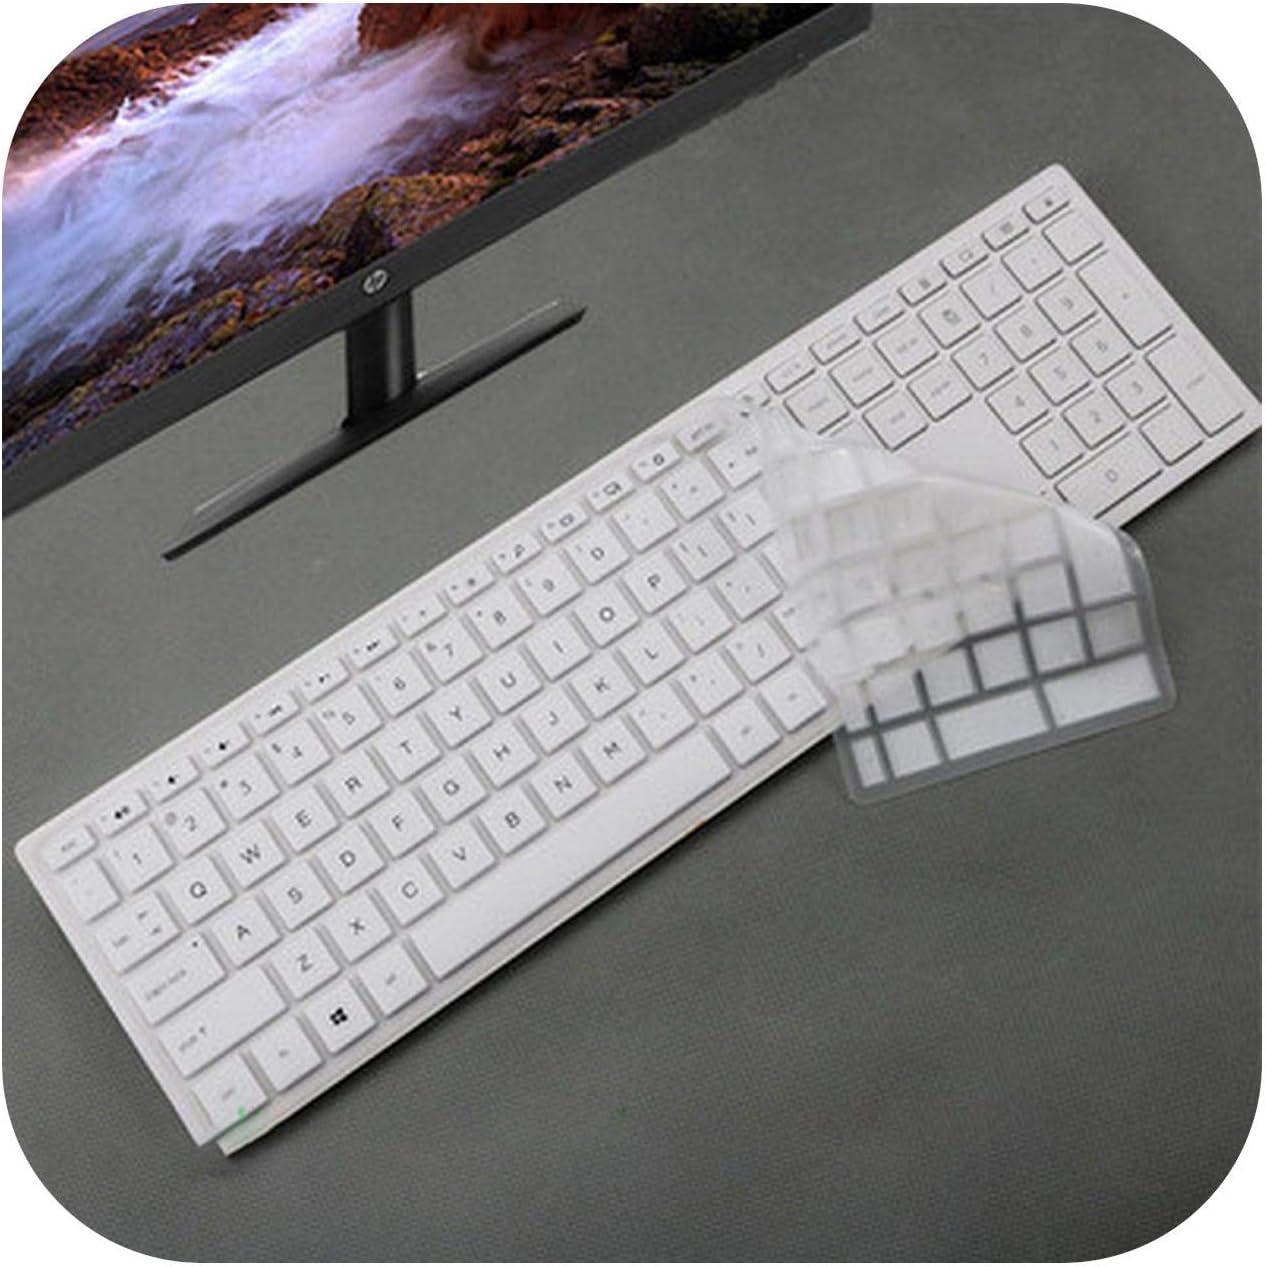 2020 Desktop Keyboard Cover Protector Skin Computer for Hp Pavilion All in One Pc 24 Xa 24 Xa0002A 24 Xa0300Nd 24 Xa0051Hk 23.8 Inch-Gradual SkyBlue